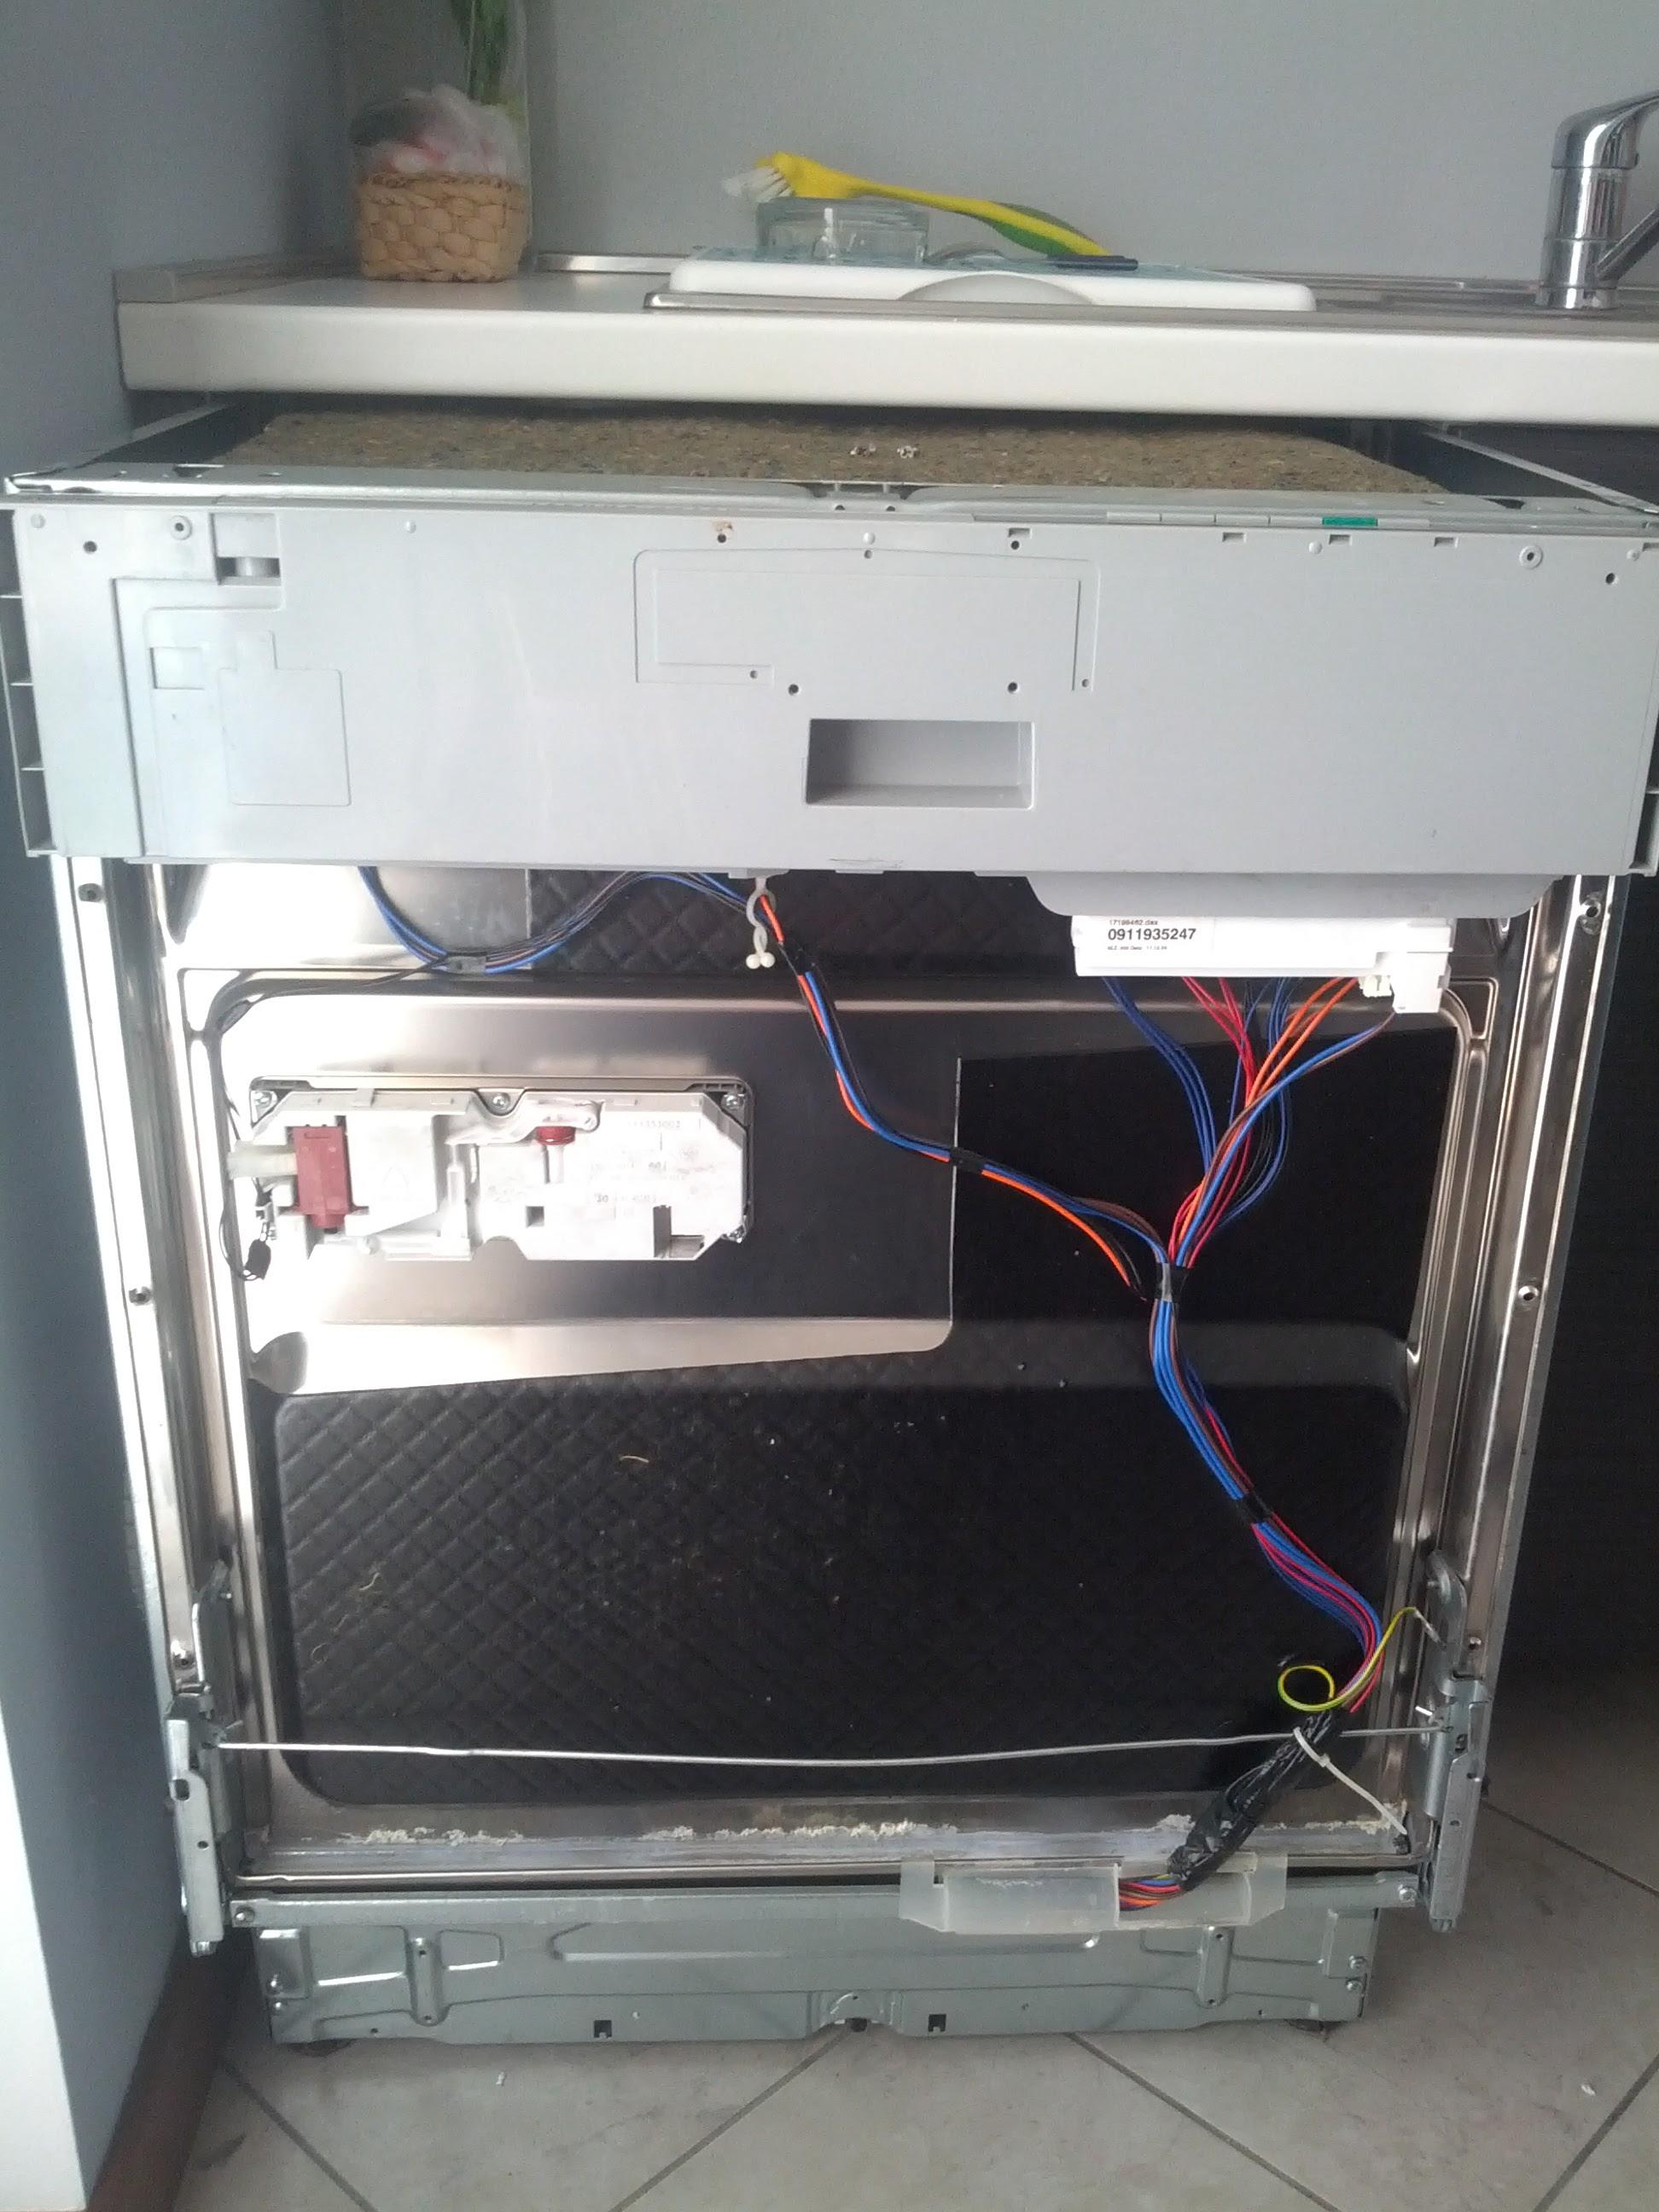 Sostituzione cerniere lavastoviglie Rex tt800 +Assistenza Rex ...